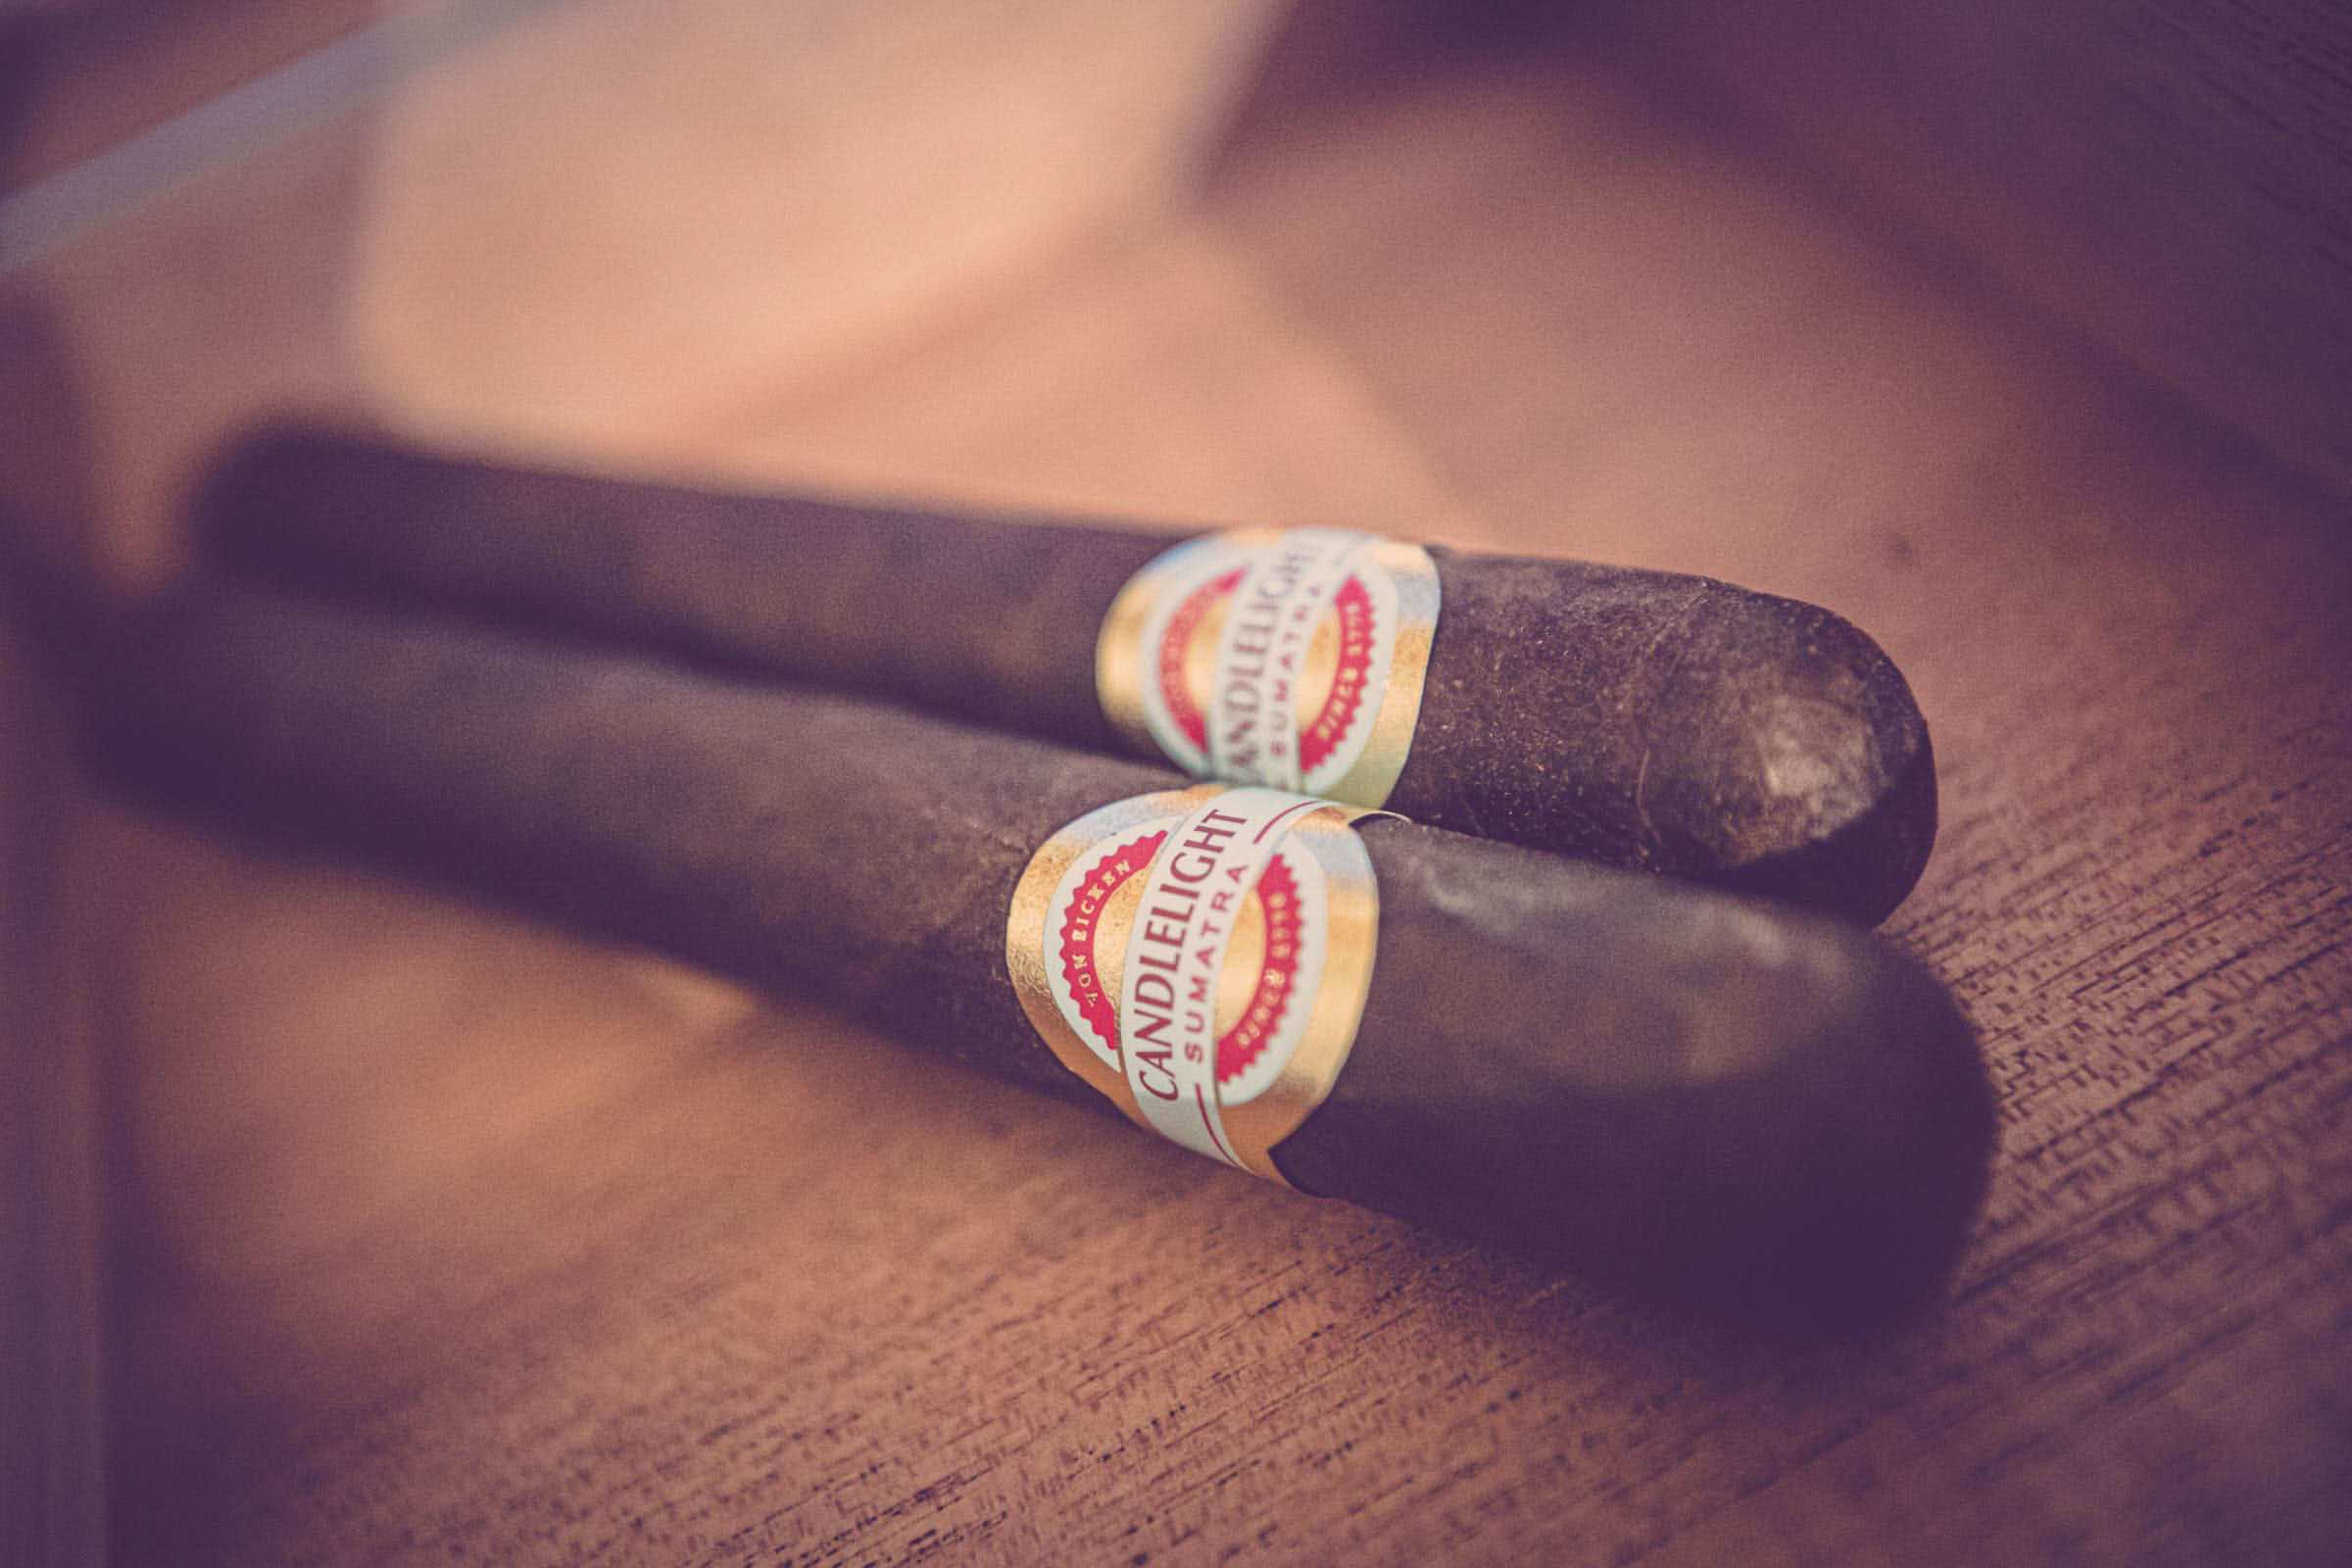 Zigarrendreher | Hamburg | Zigarrenroller | Zigarrenrollerin | Trocadero | Kaufen | Buchen | Mieten | Handgemacht | Zigarren | Zylinder | Fabrik | Herstellung | Churchill | Robusto | Robusto | Corona | Banderole | Bauchbinde